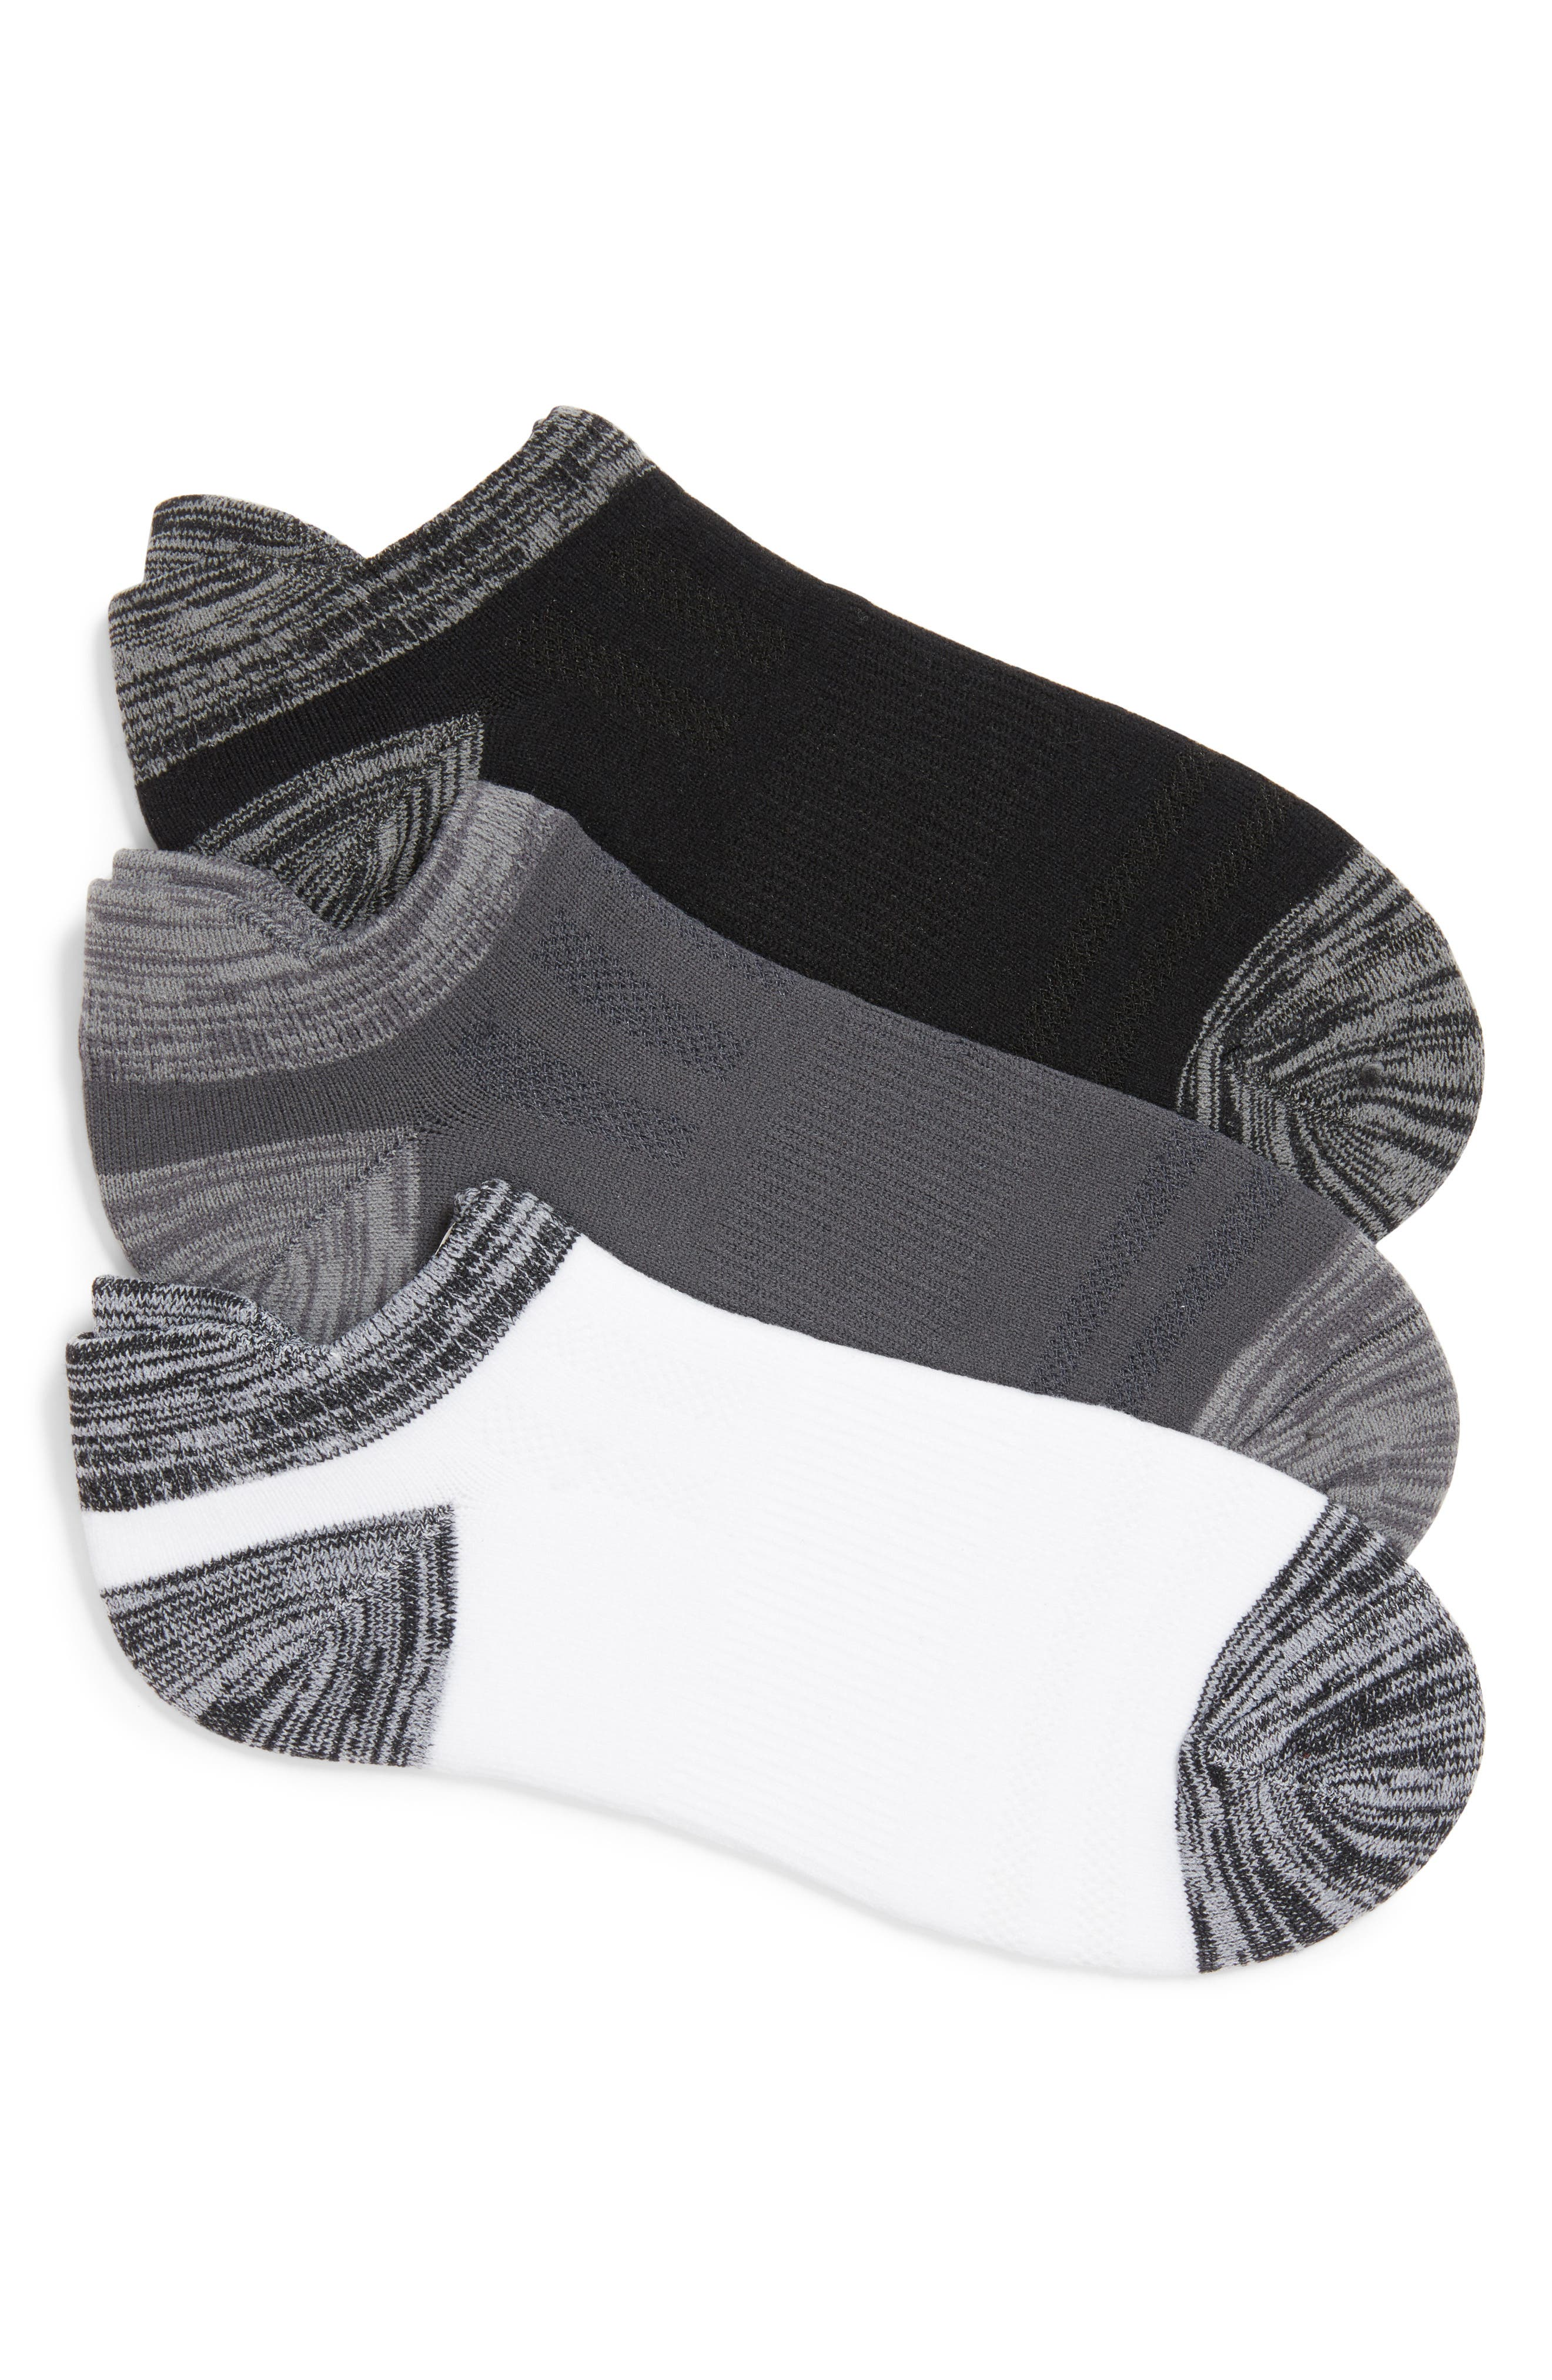 3-Pack Low Cut Socks,                             Main thumbnail 1, color,                             002